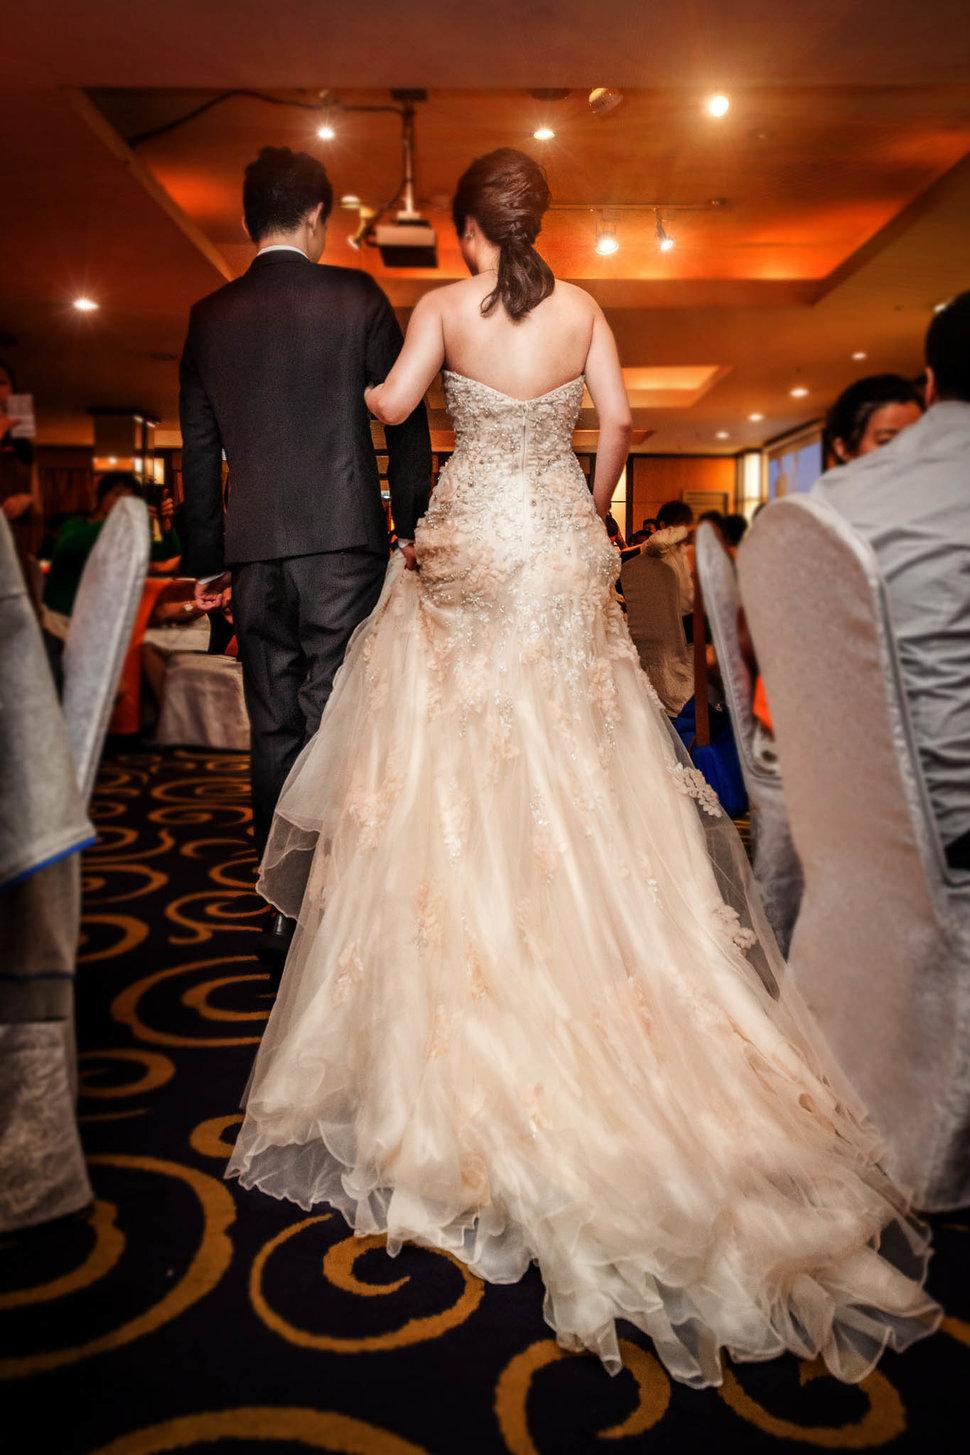 18PHOTO-元善❤️ 傳瑀(編號:308849) - 18PHOTO 婚紗影像攝影工作室 - 結婚吧一站式婚禮服務平台